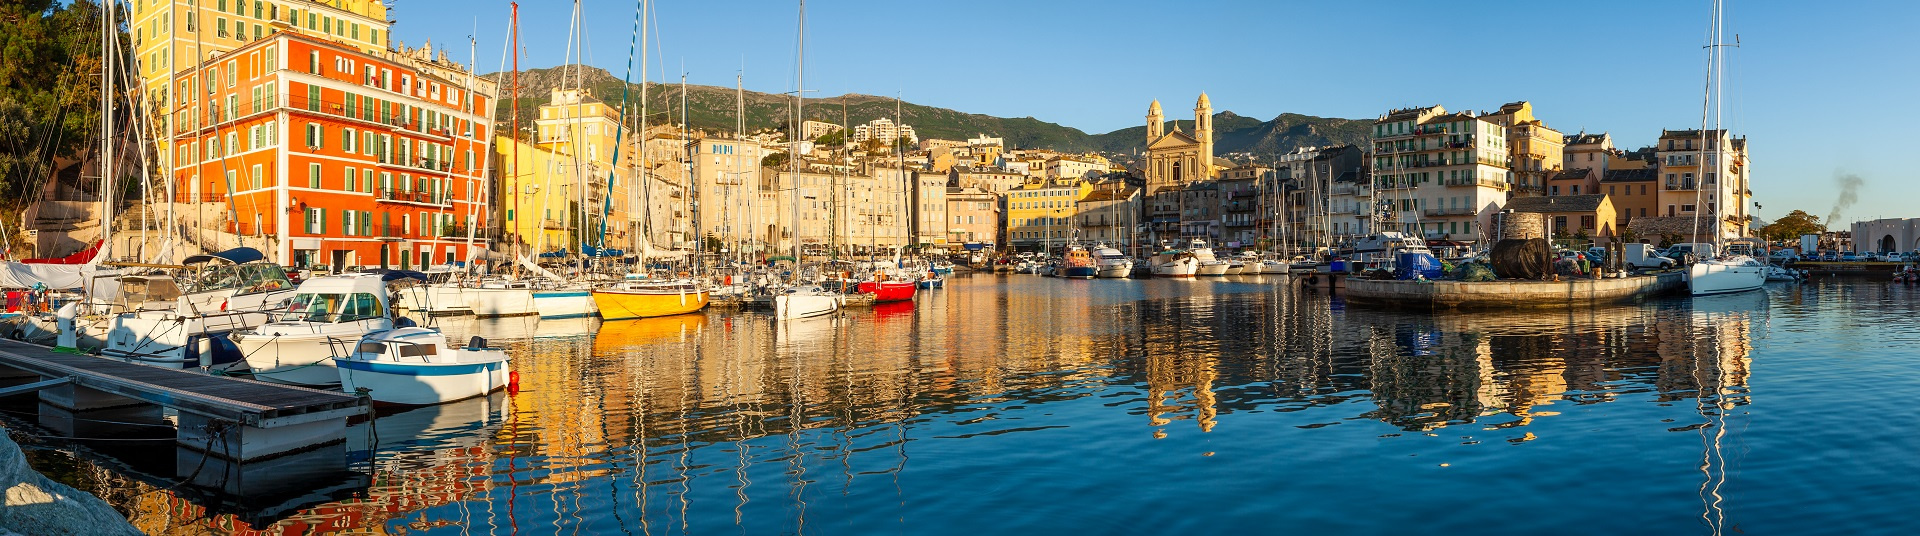 Week-end pas cher Bastia